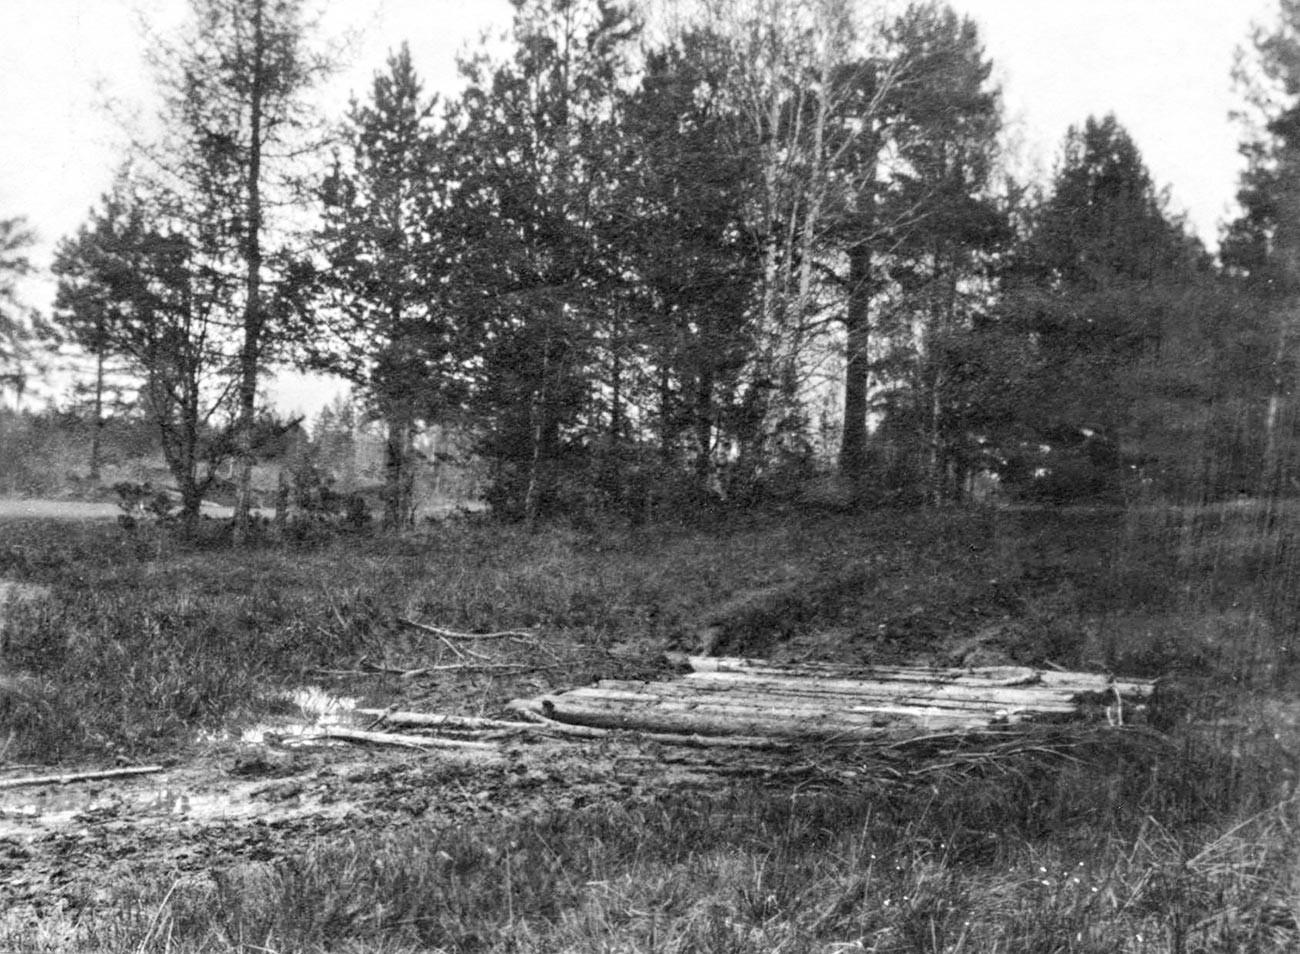 The Porosenkov Ravine. The gravesite of Nicholas II, his family, and servants on Koptyaki Road beneath boles and railroad ties.